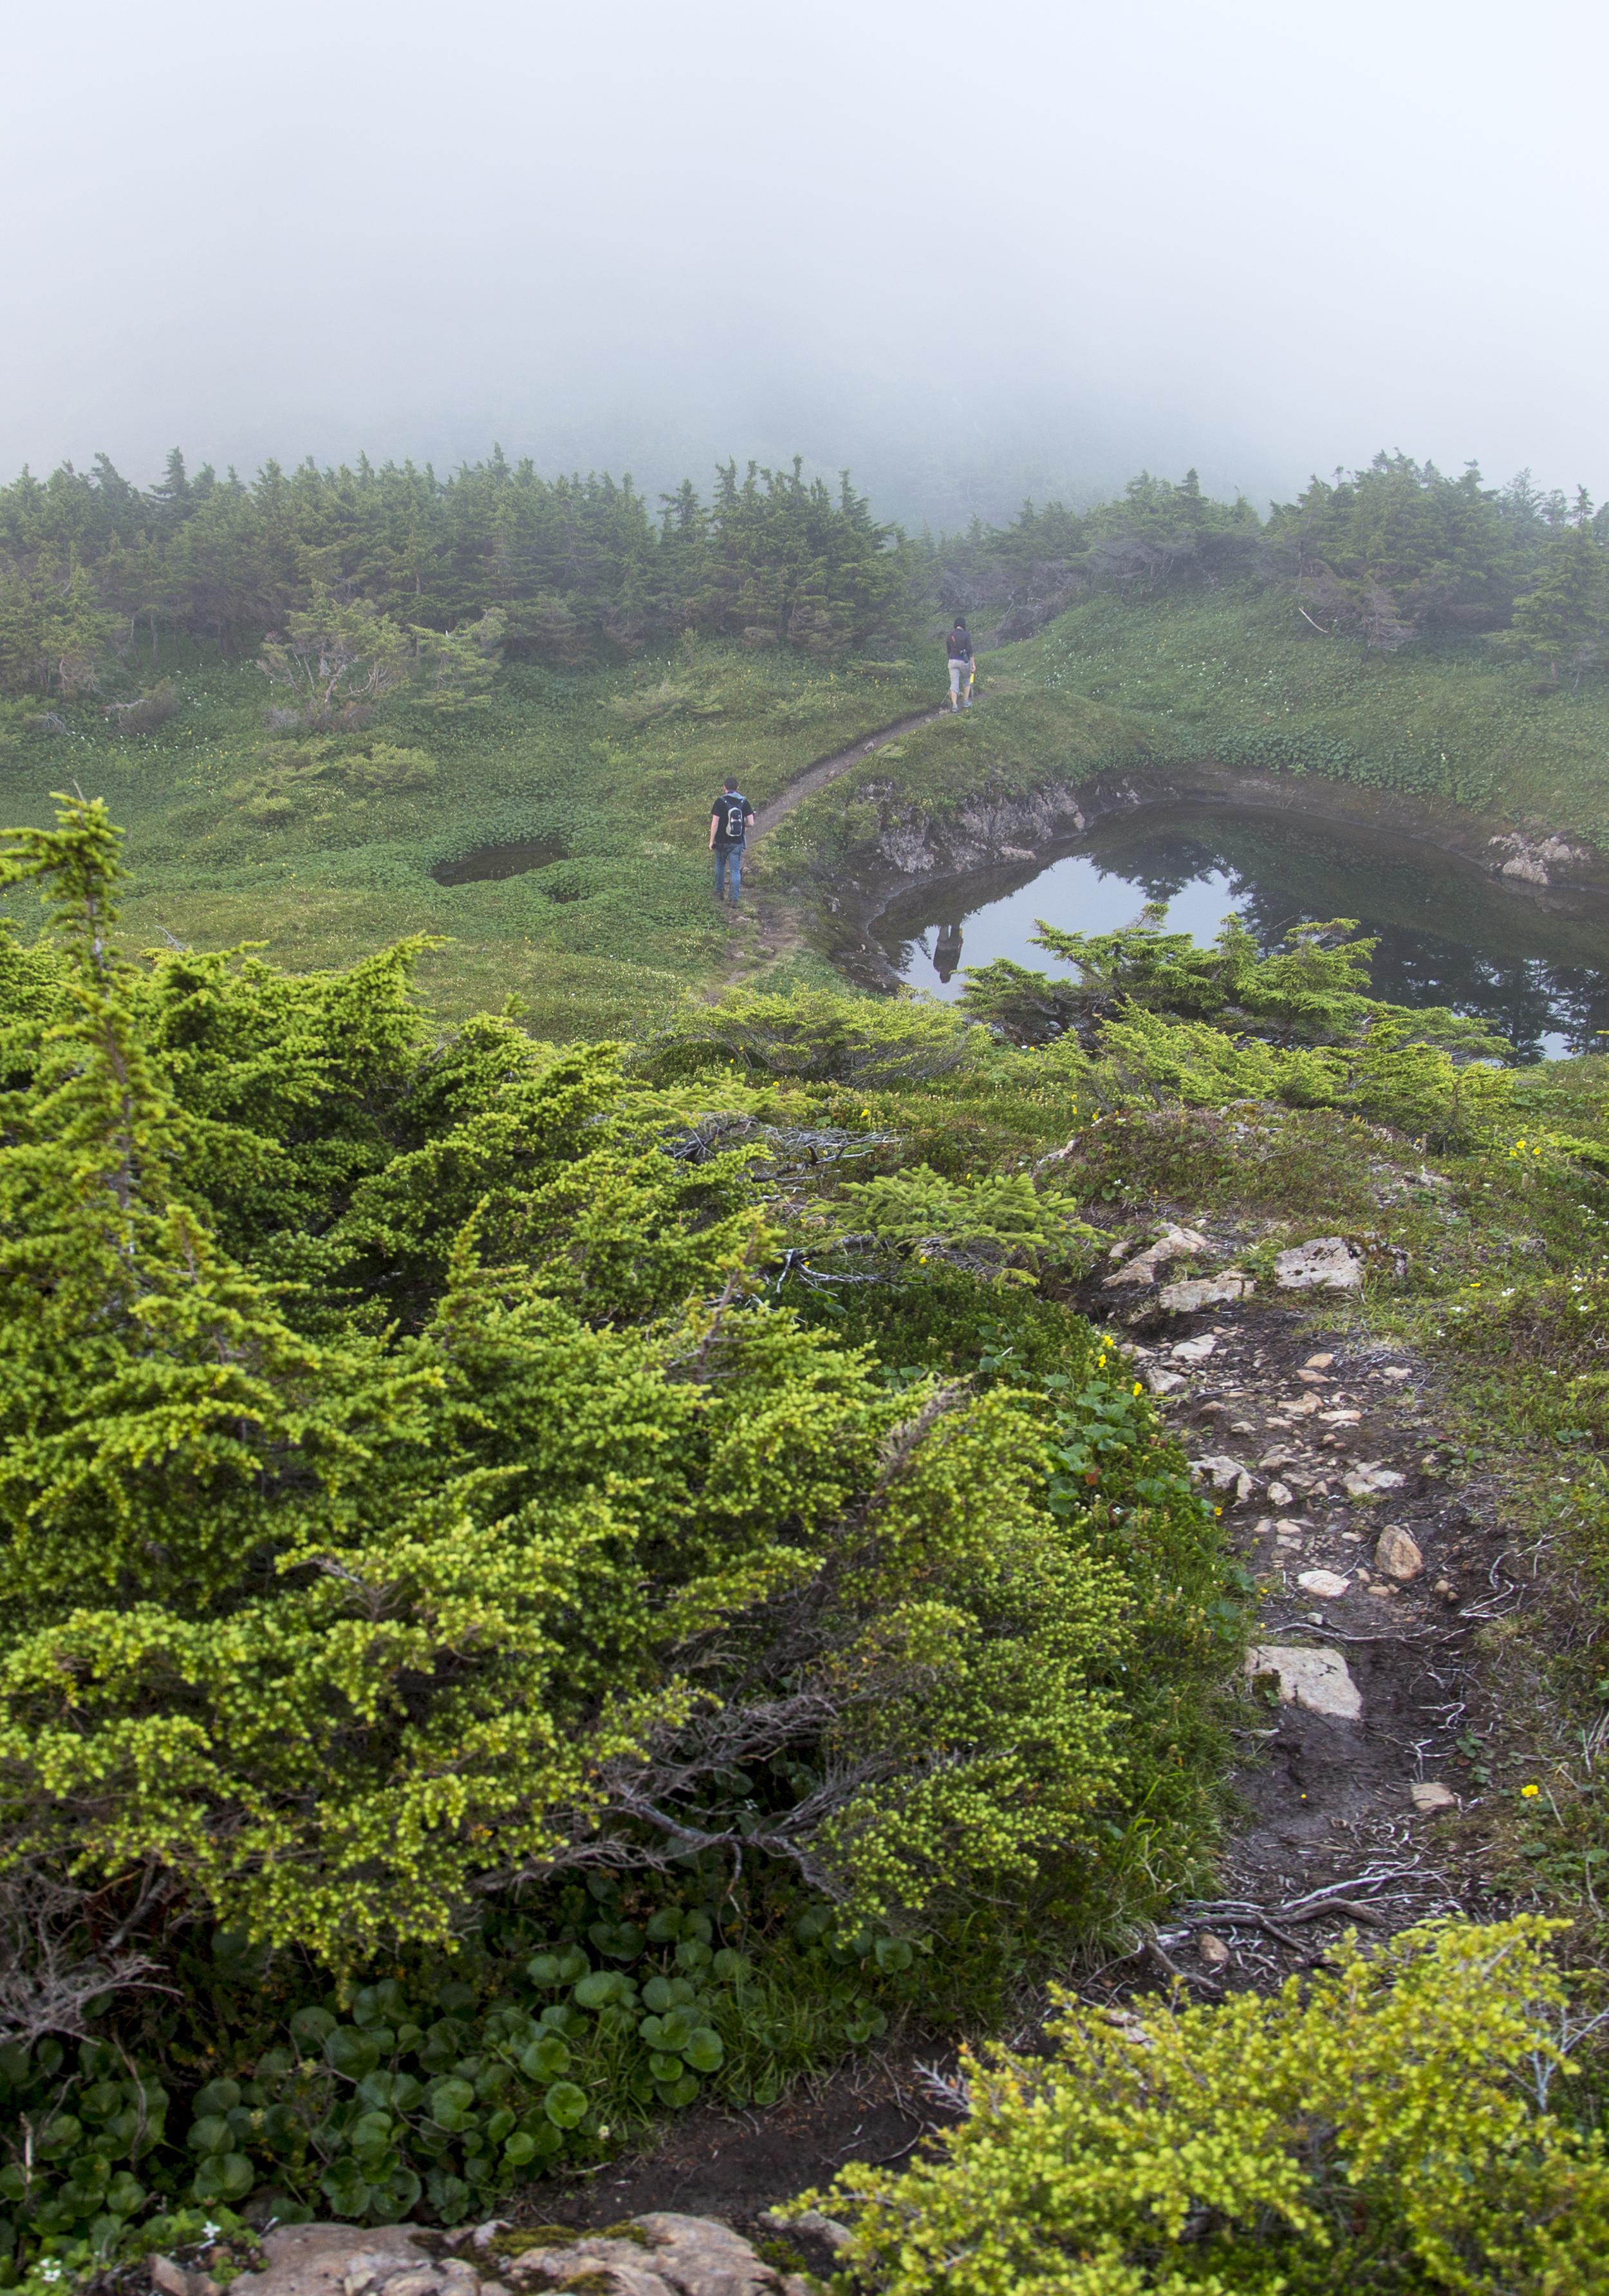 Hiking Eyak Peak in the fog